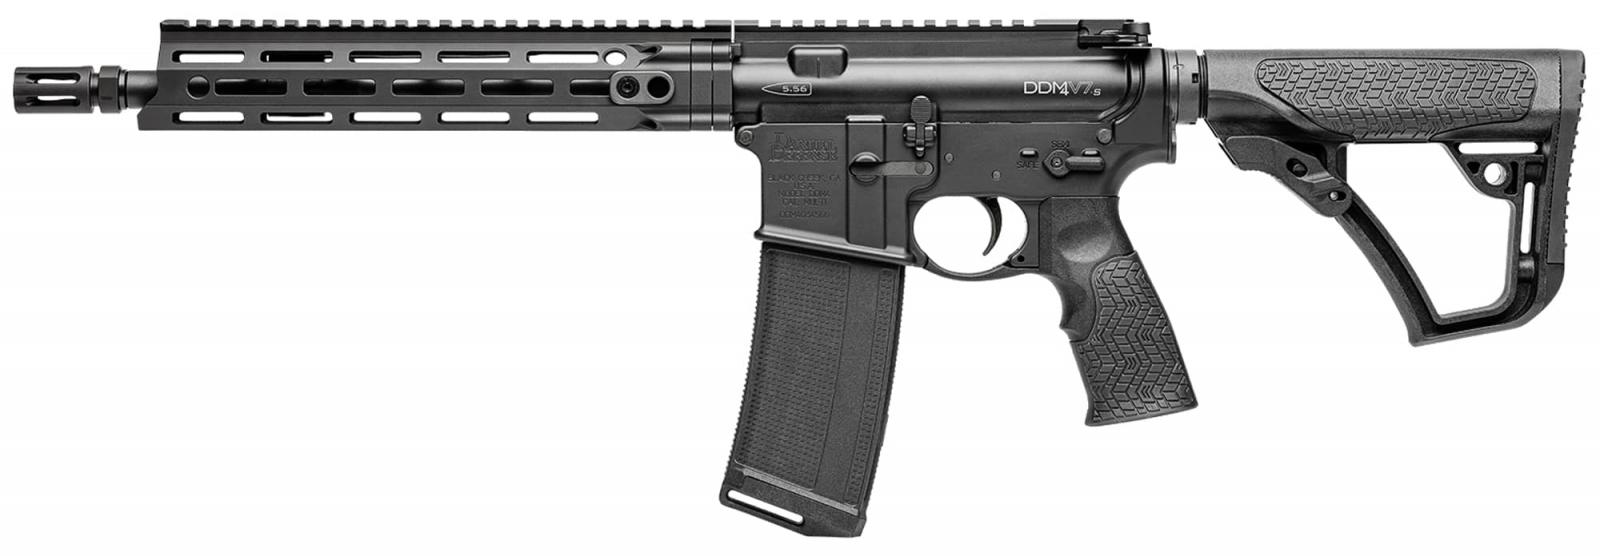 Carabine semi-auto DANIEL DEFENSE DDM4 V7S type AR15  Cal .223